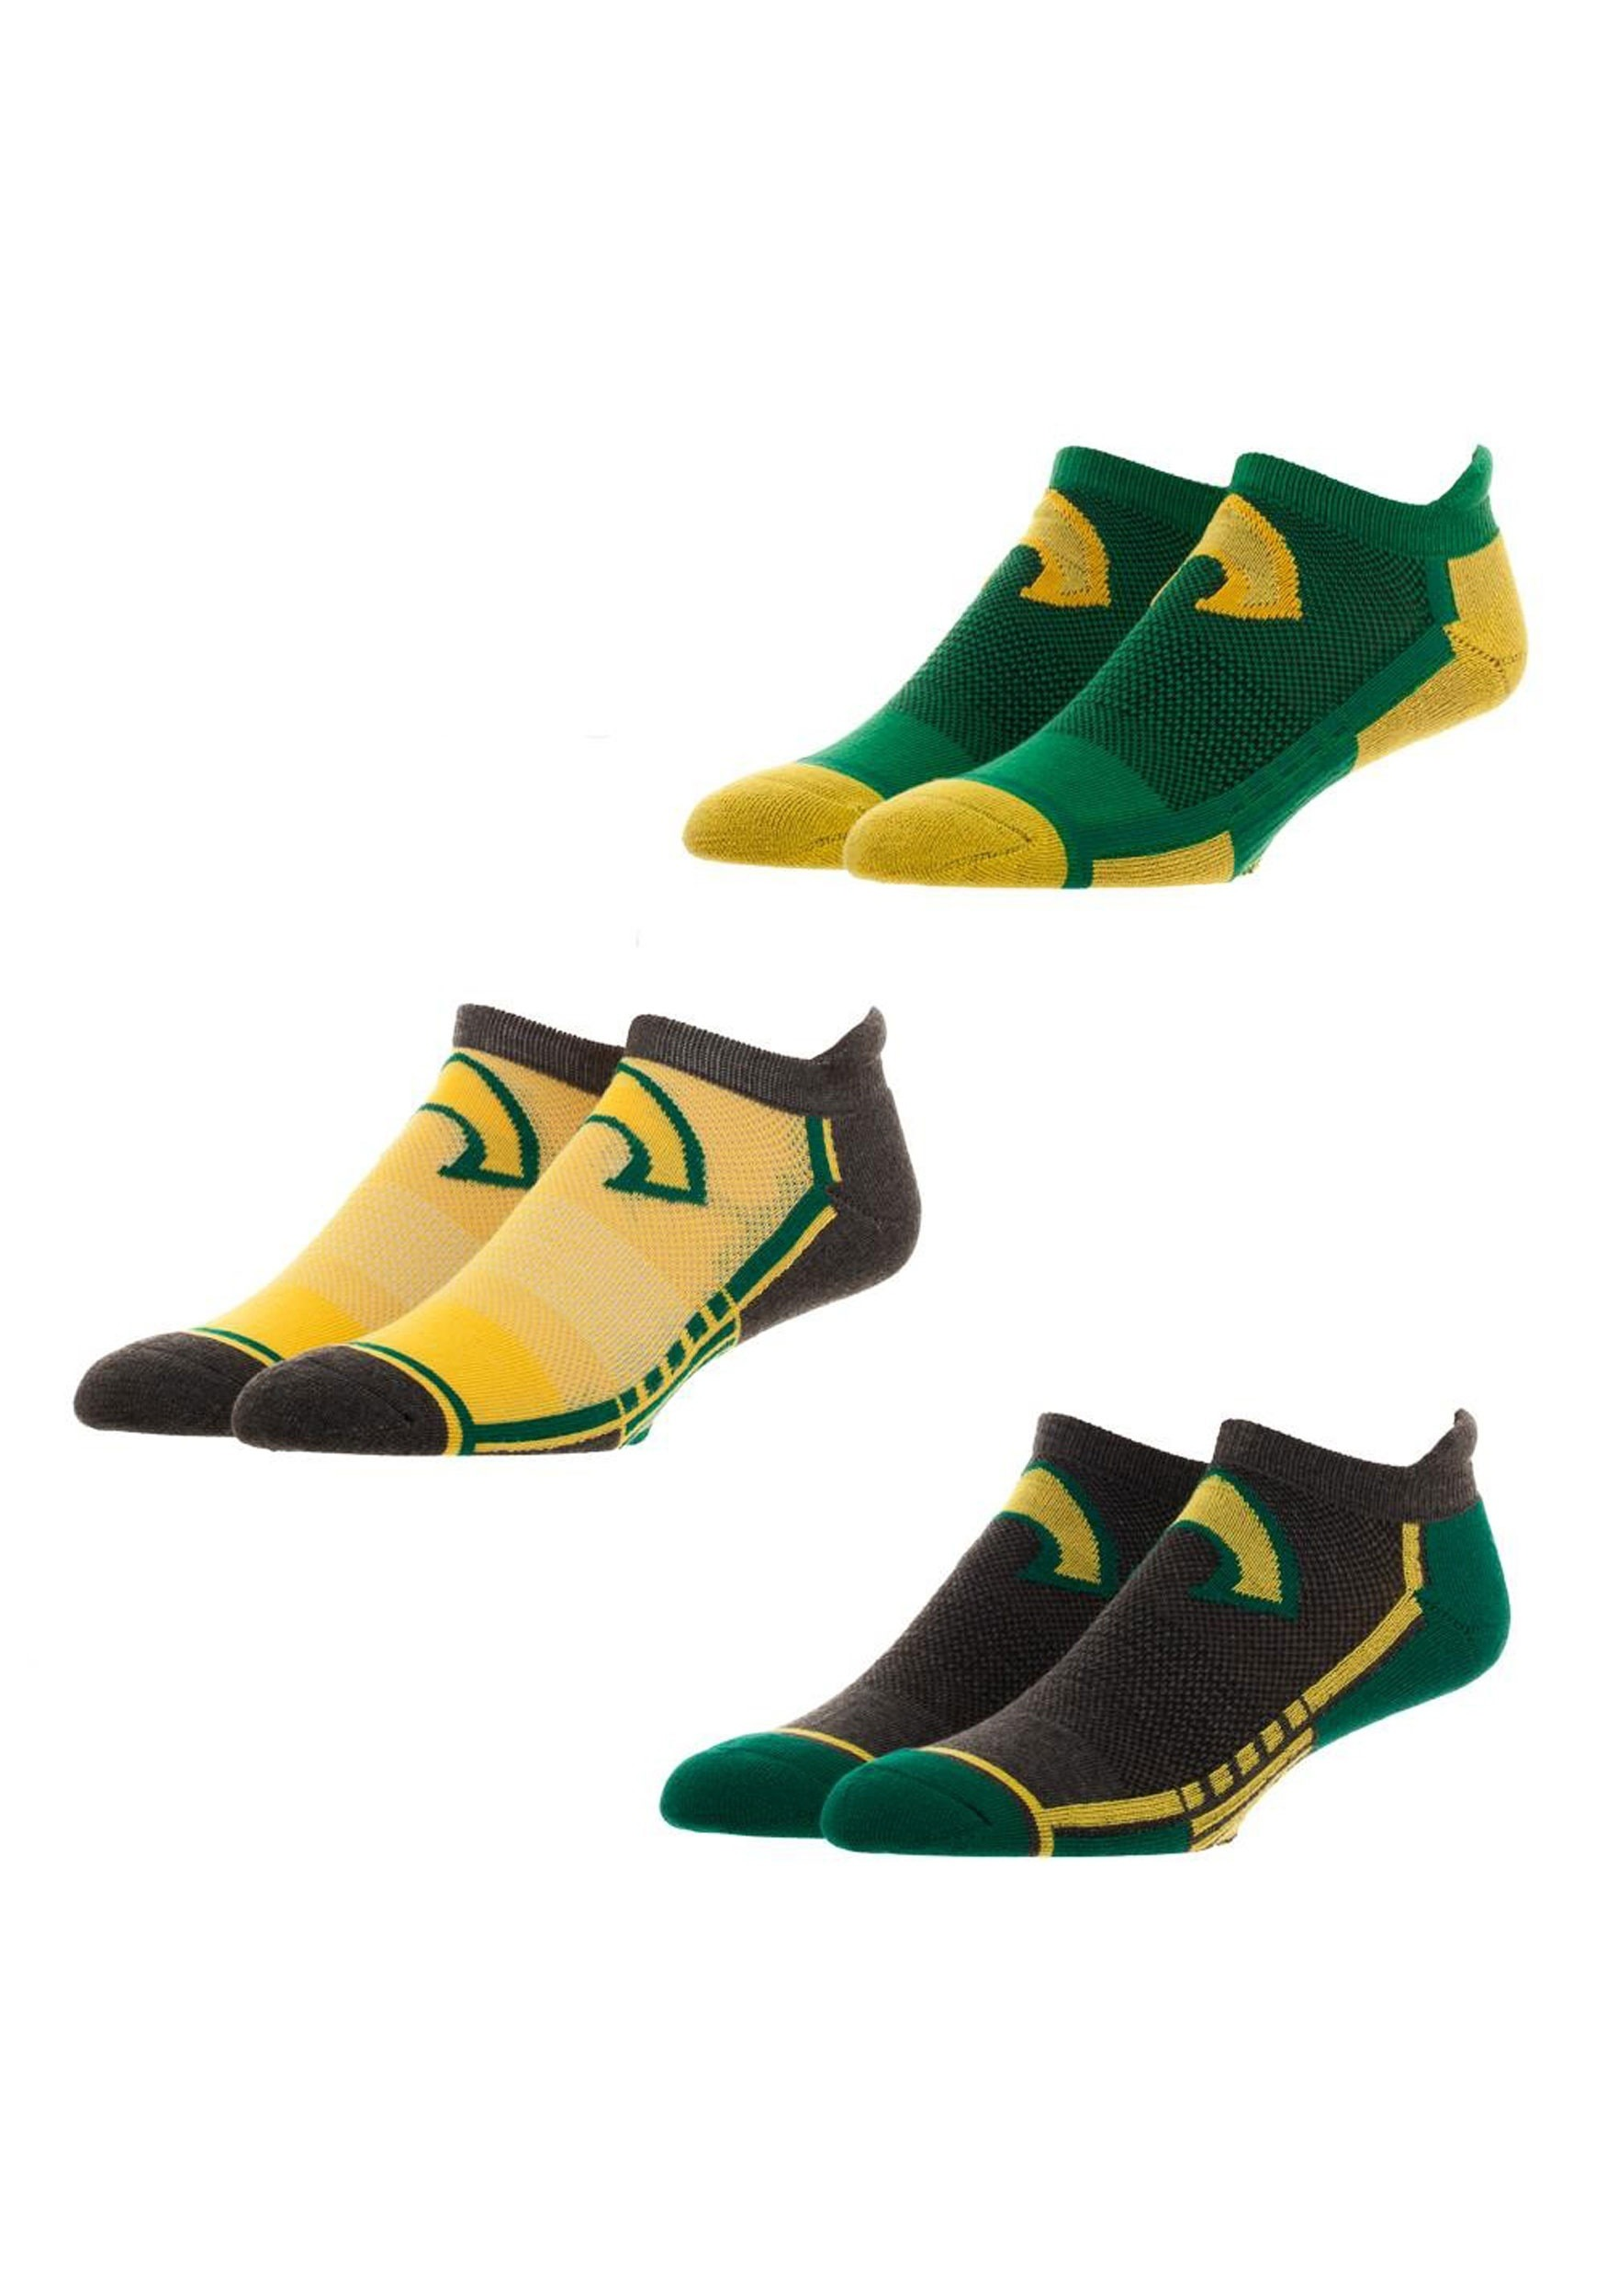 Aquaman 3 pair mens active ankle socks